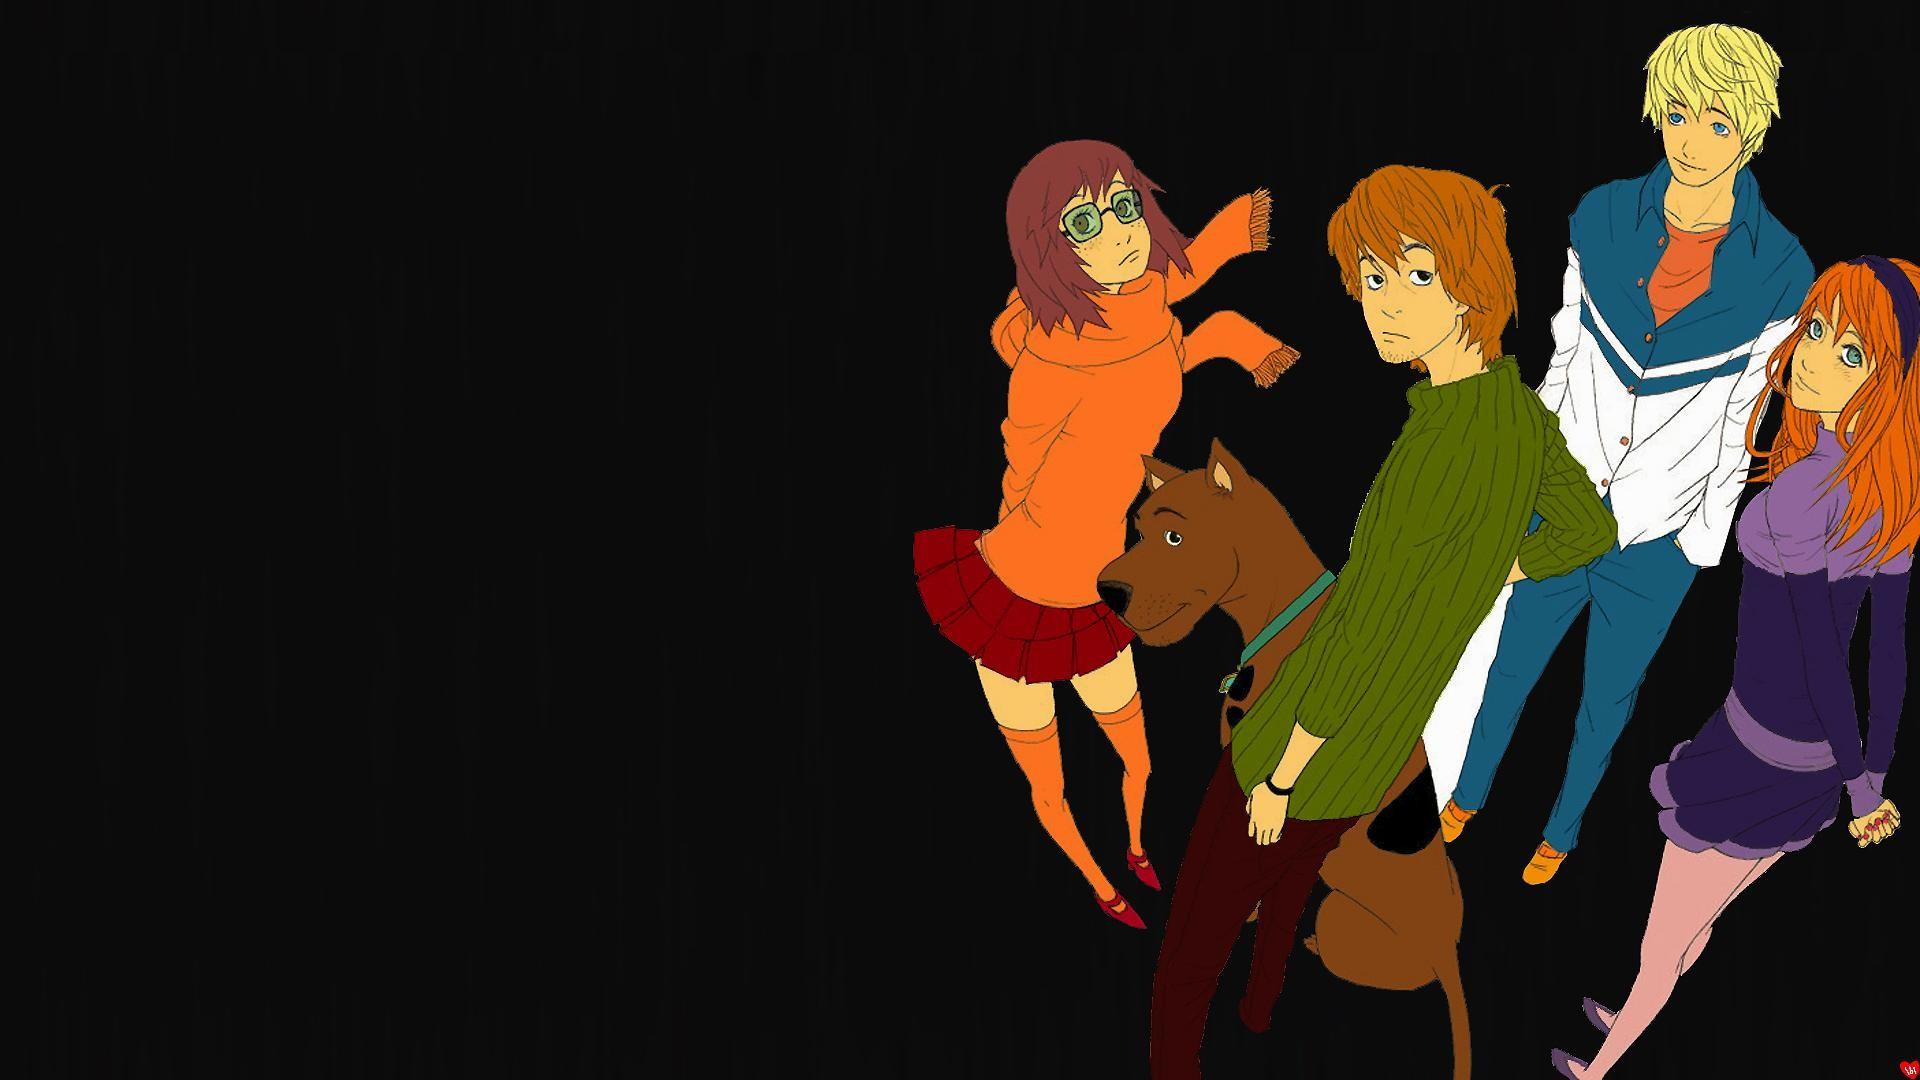 wallpaper.wiki-Scooby-Doo-Wallpaper-Download-Free-PIC-